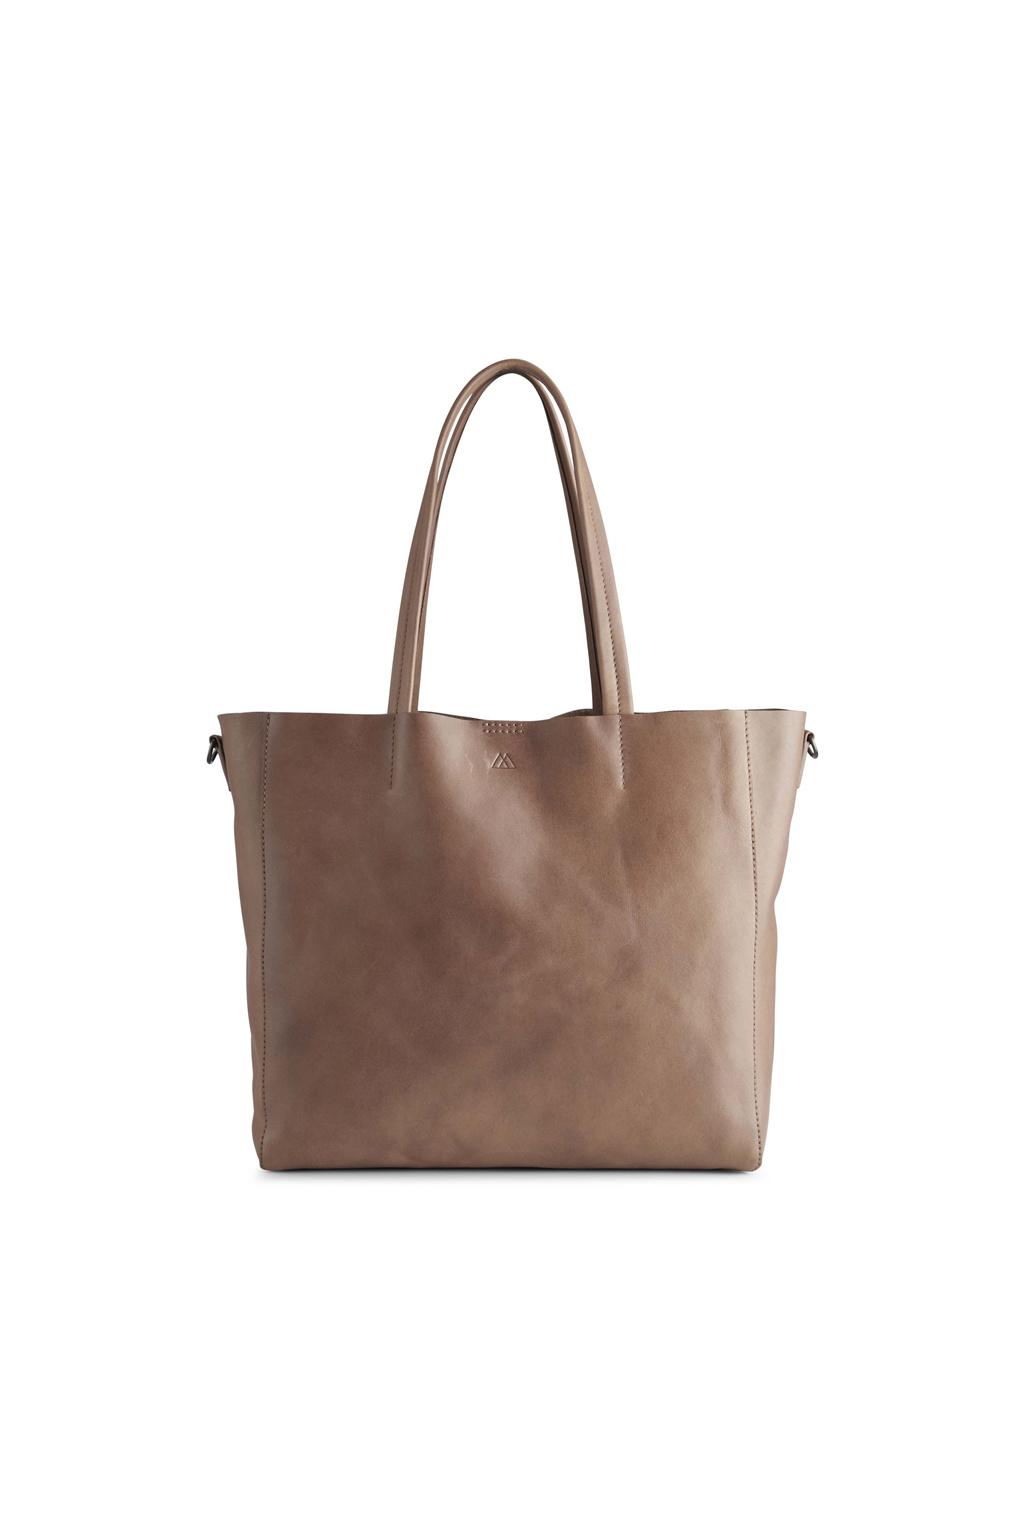 Reese Shopper Bag - Antique Caramel w/ Black-3